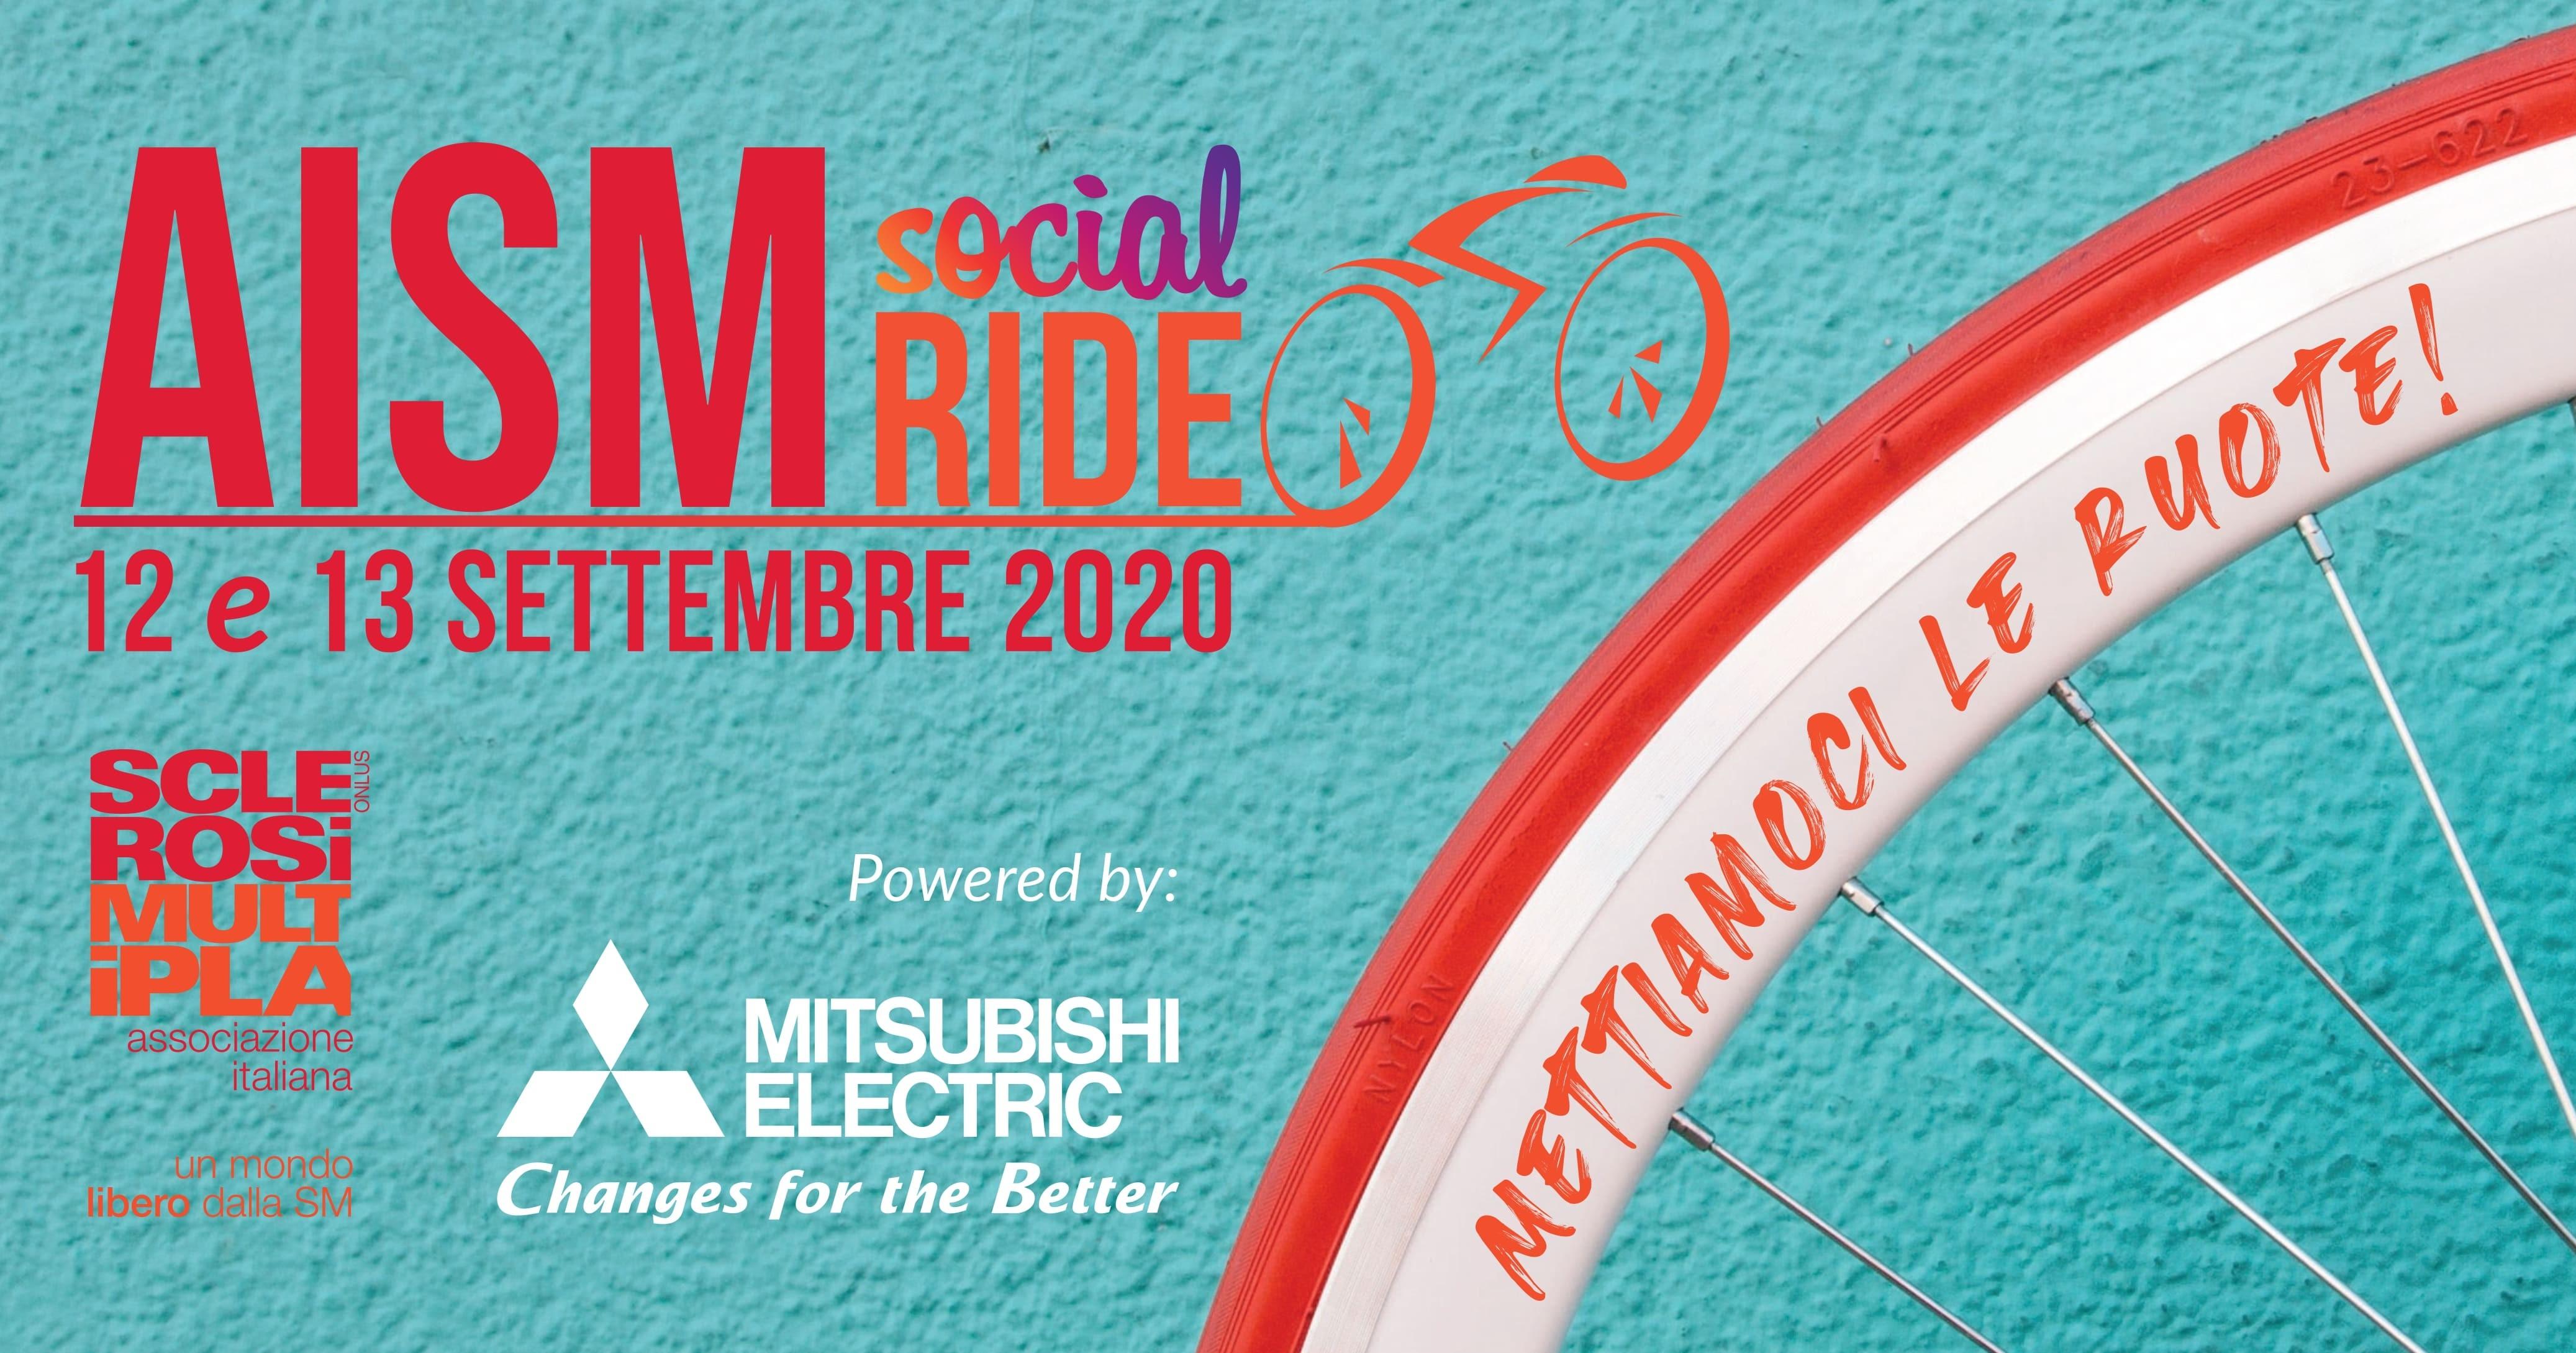 AISM SOCIAL RIDE -AISM - Sezione di Milano